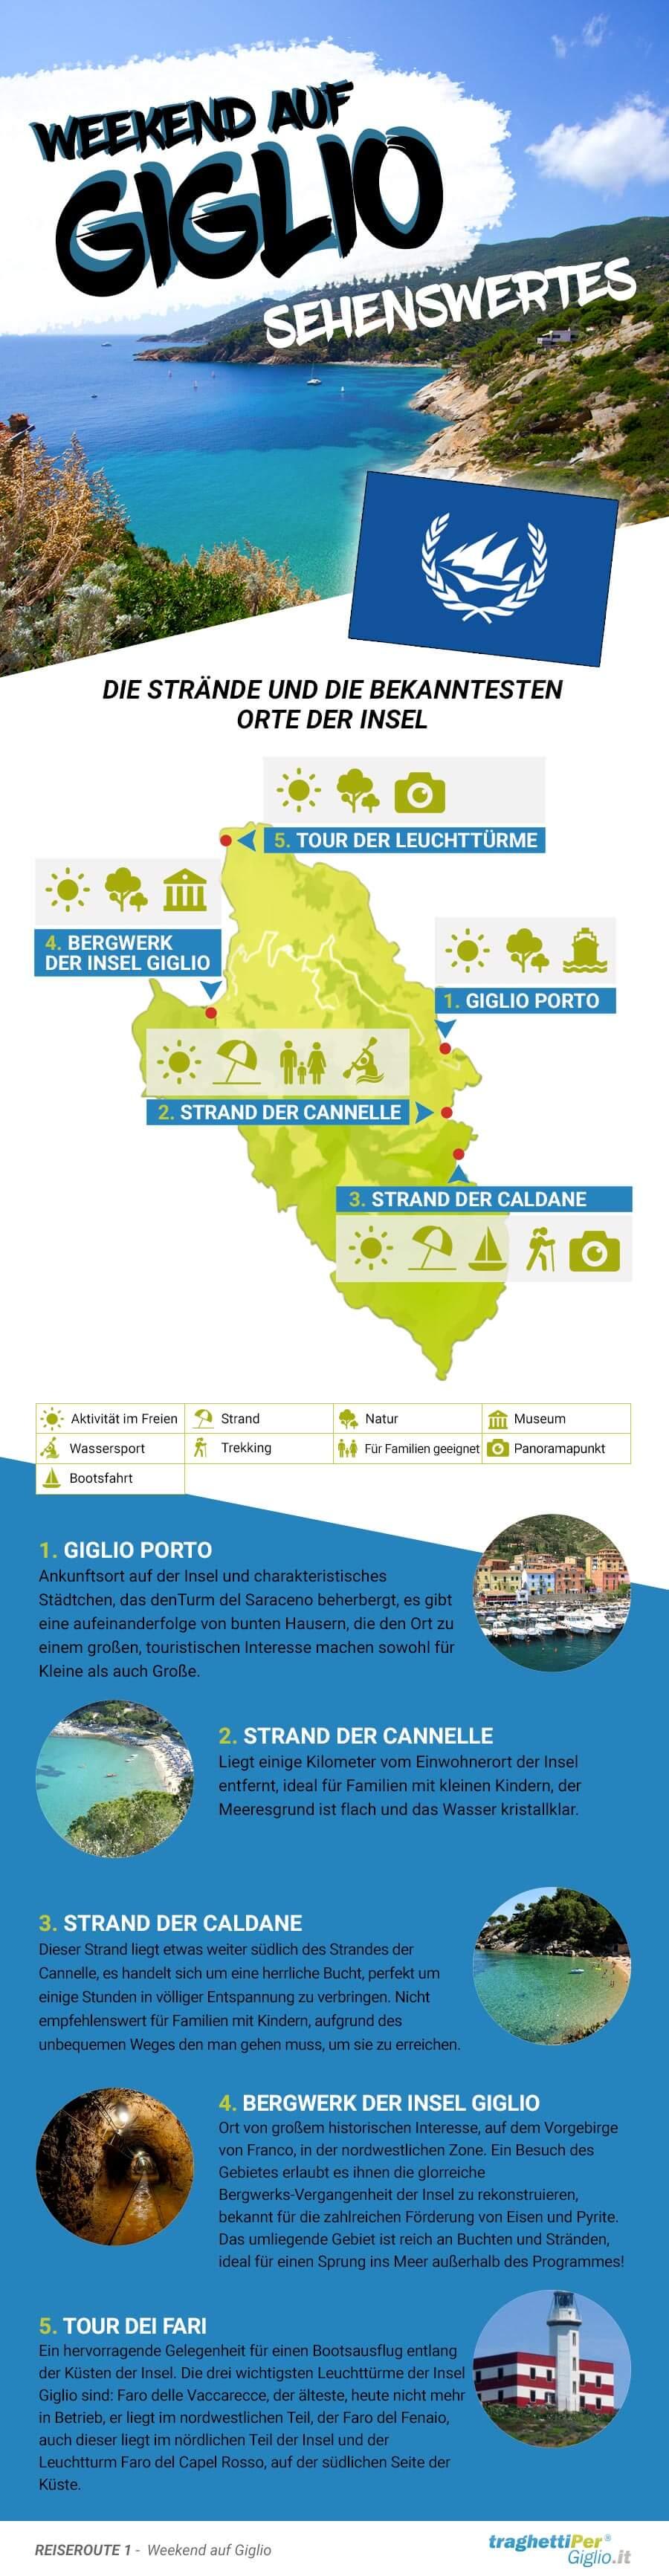 TRAVEL ITALIA Infografik Giglio